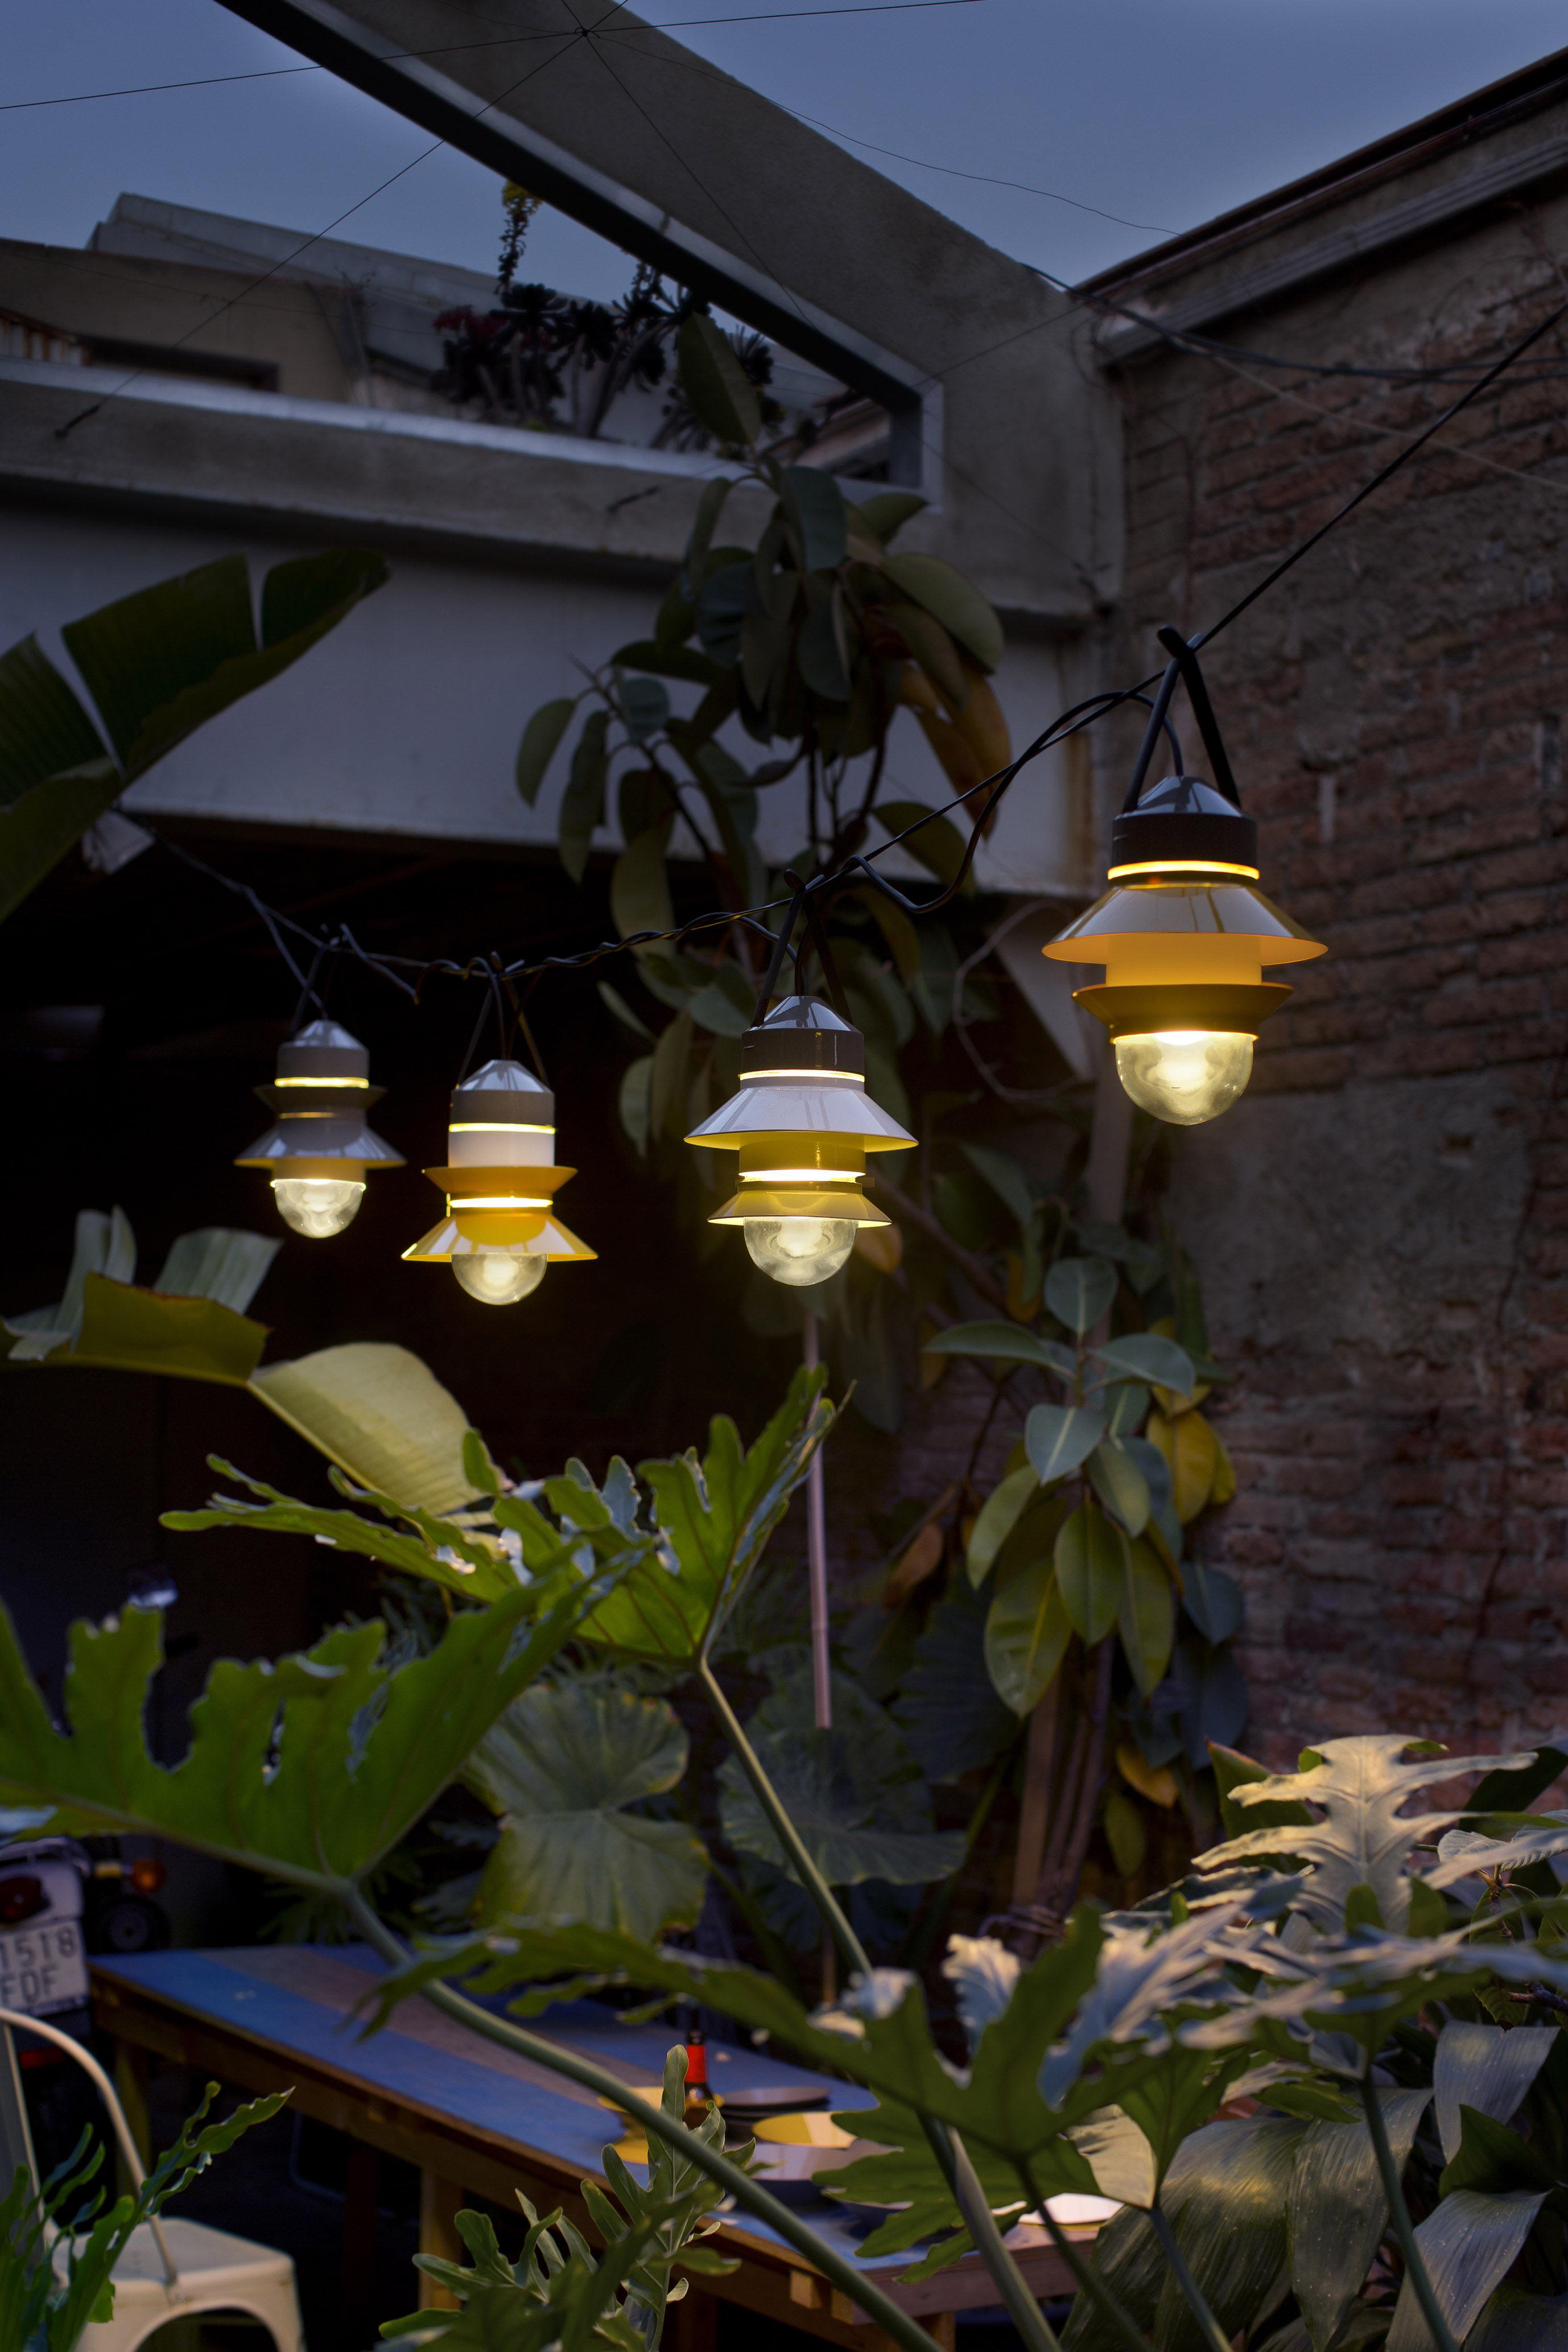 Santorini Lamp To hang Mustard yellow by Marset